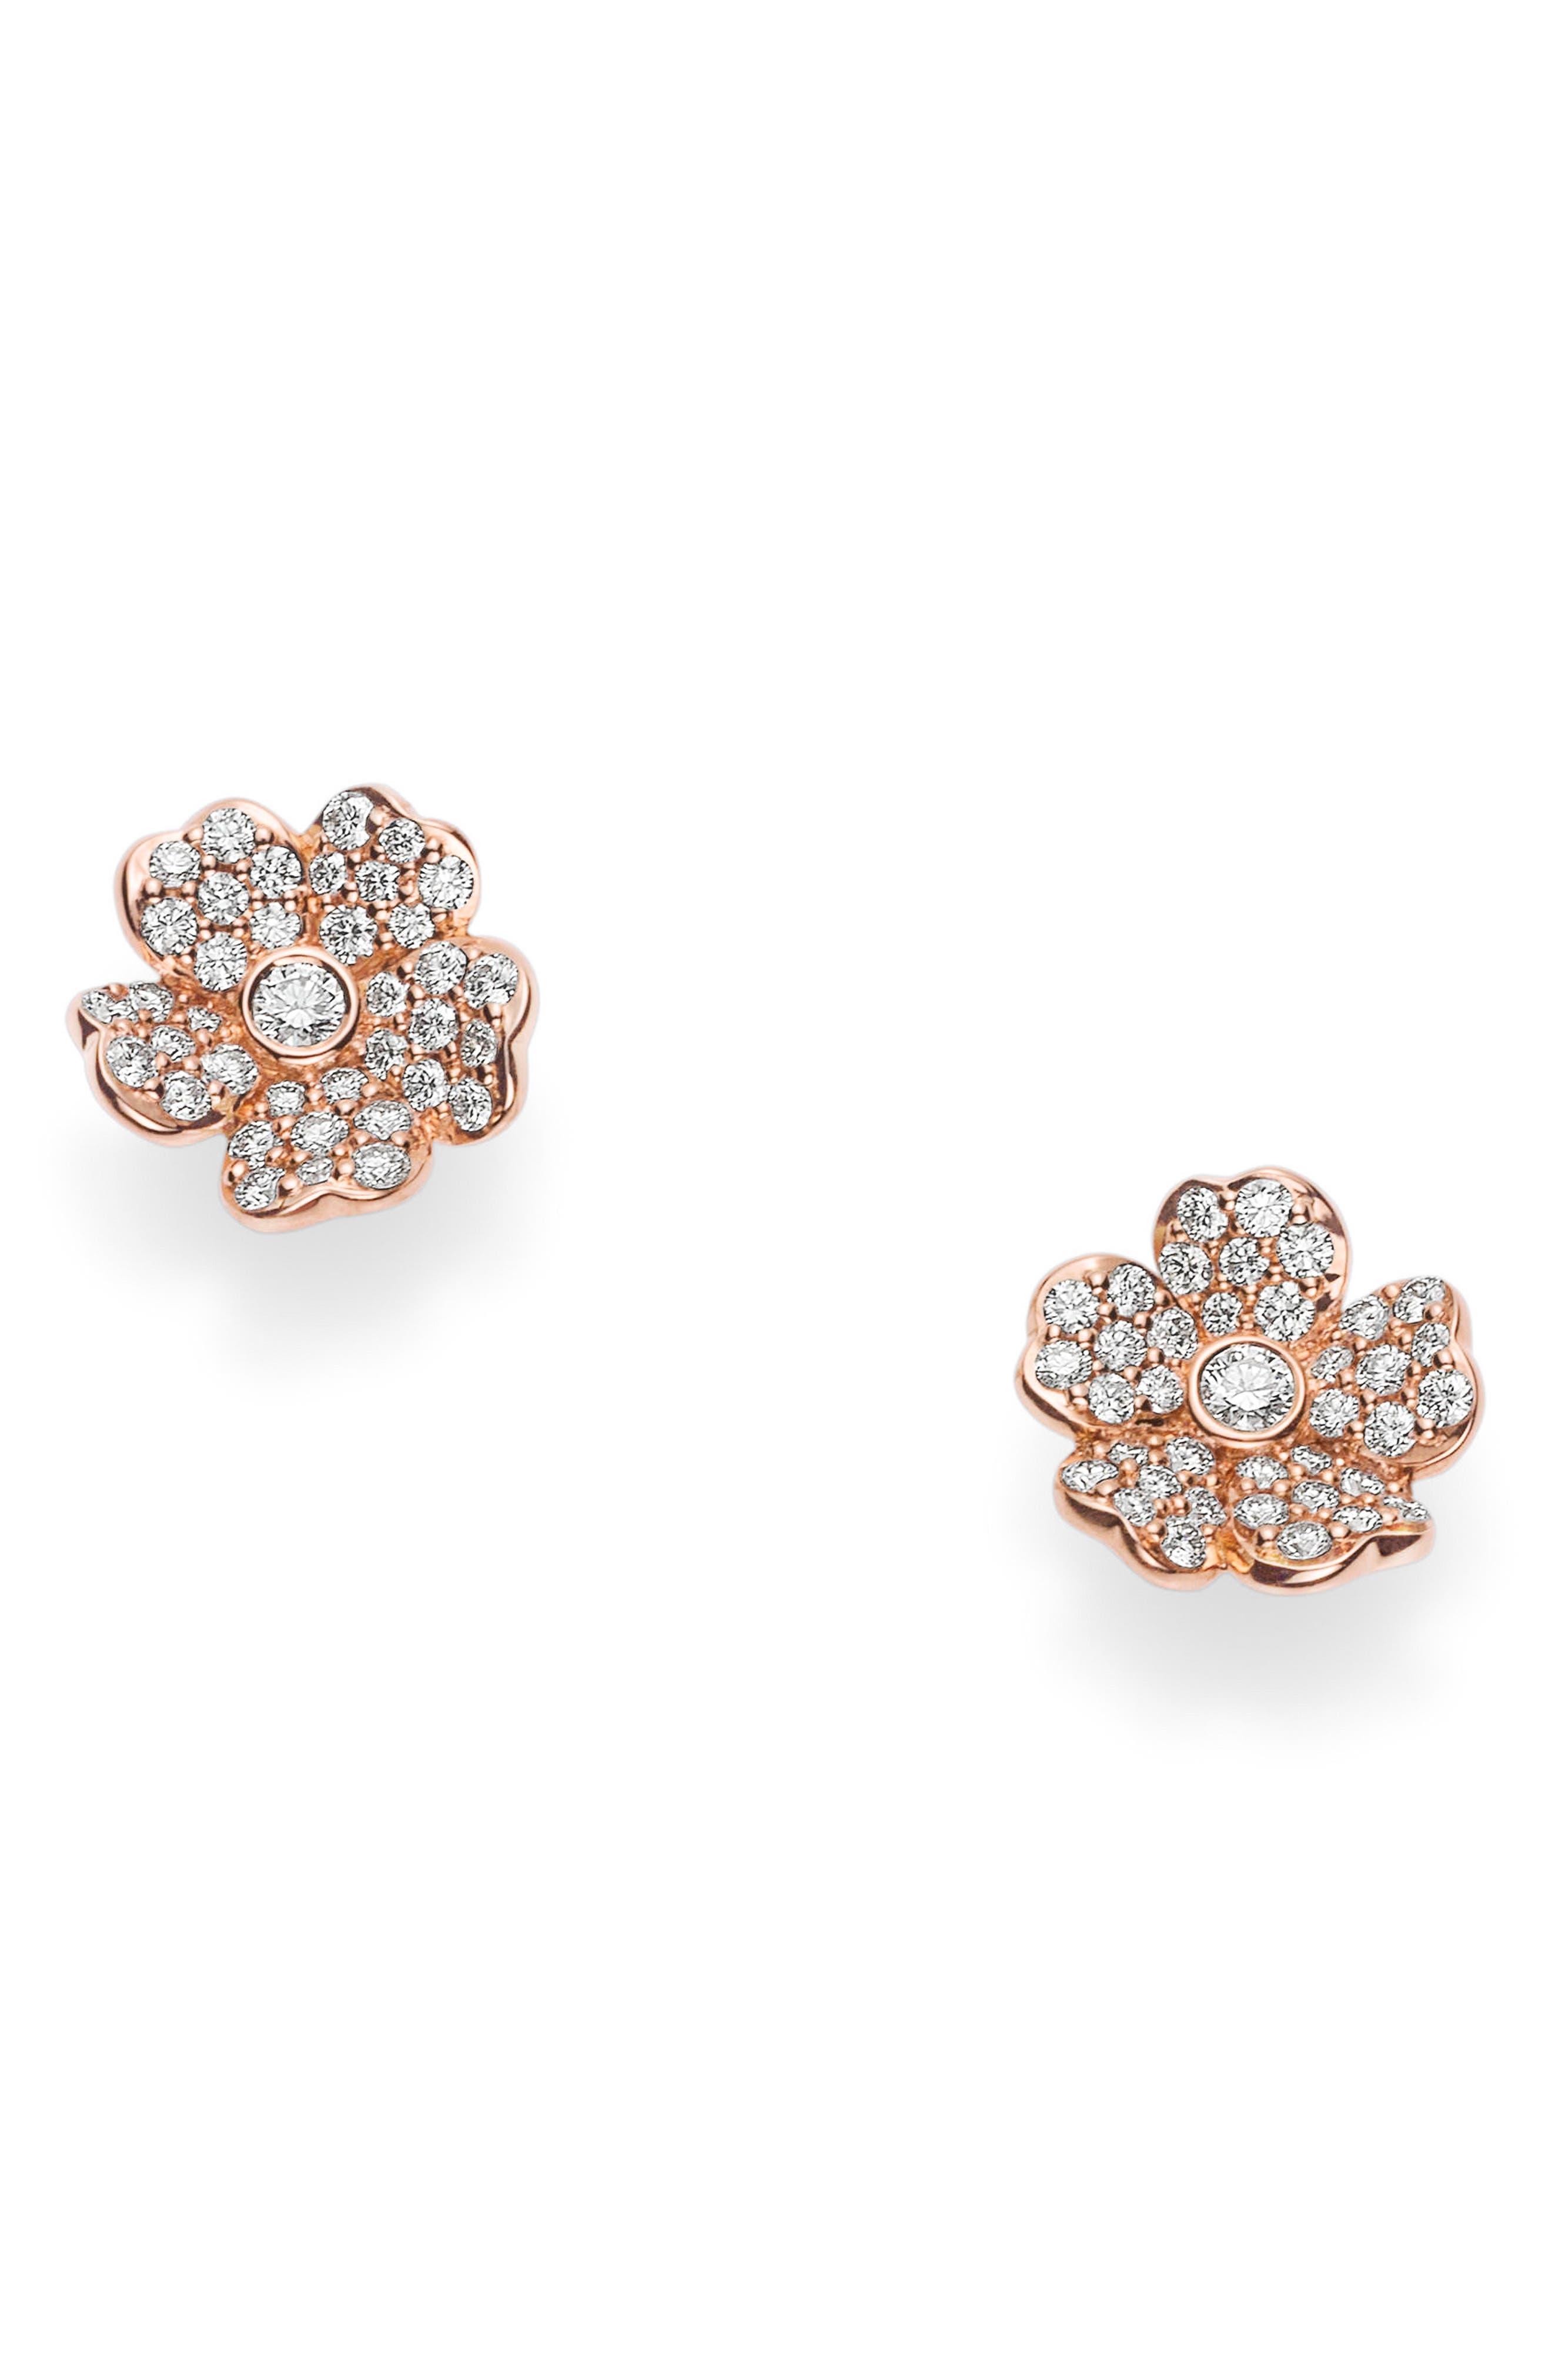 Diamond Flower Stud Earrings,                             Main thumbnail 1, color,                             ROSE GOLD